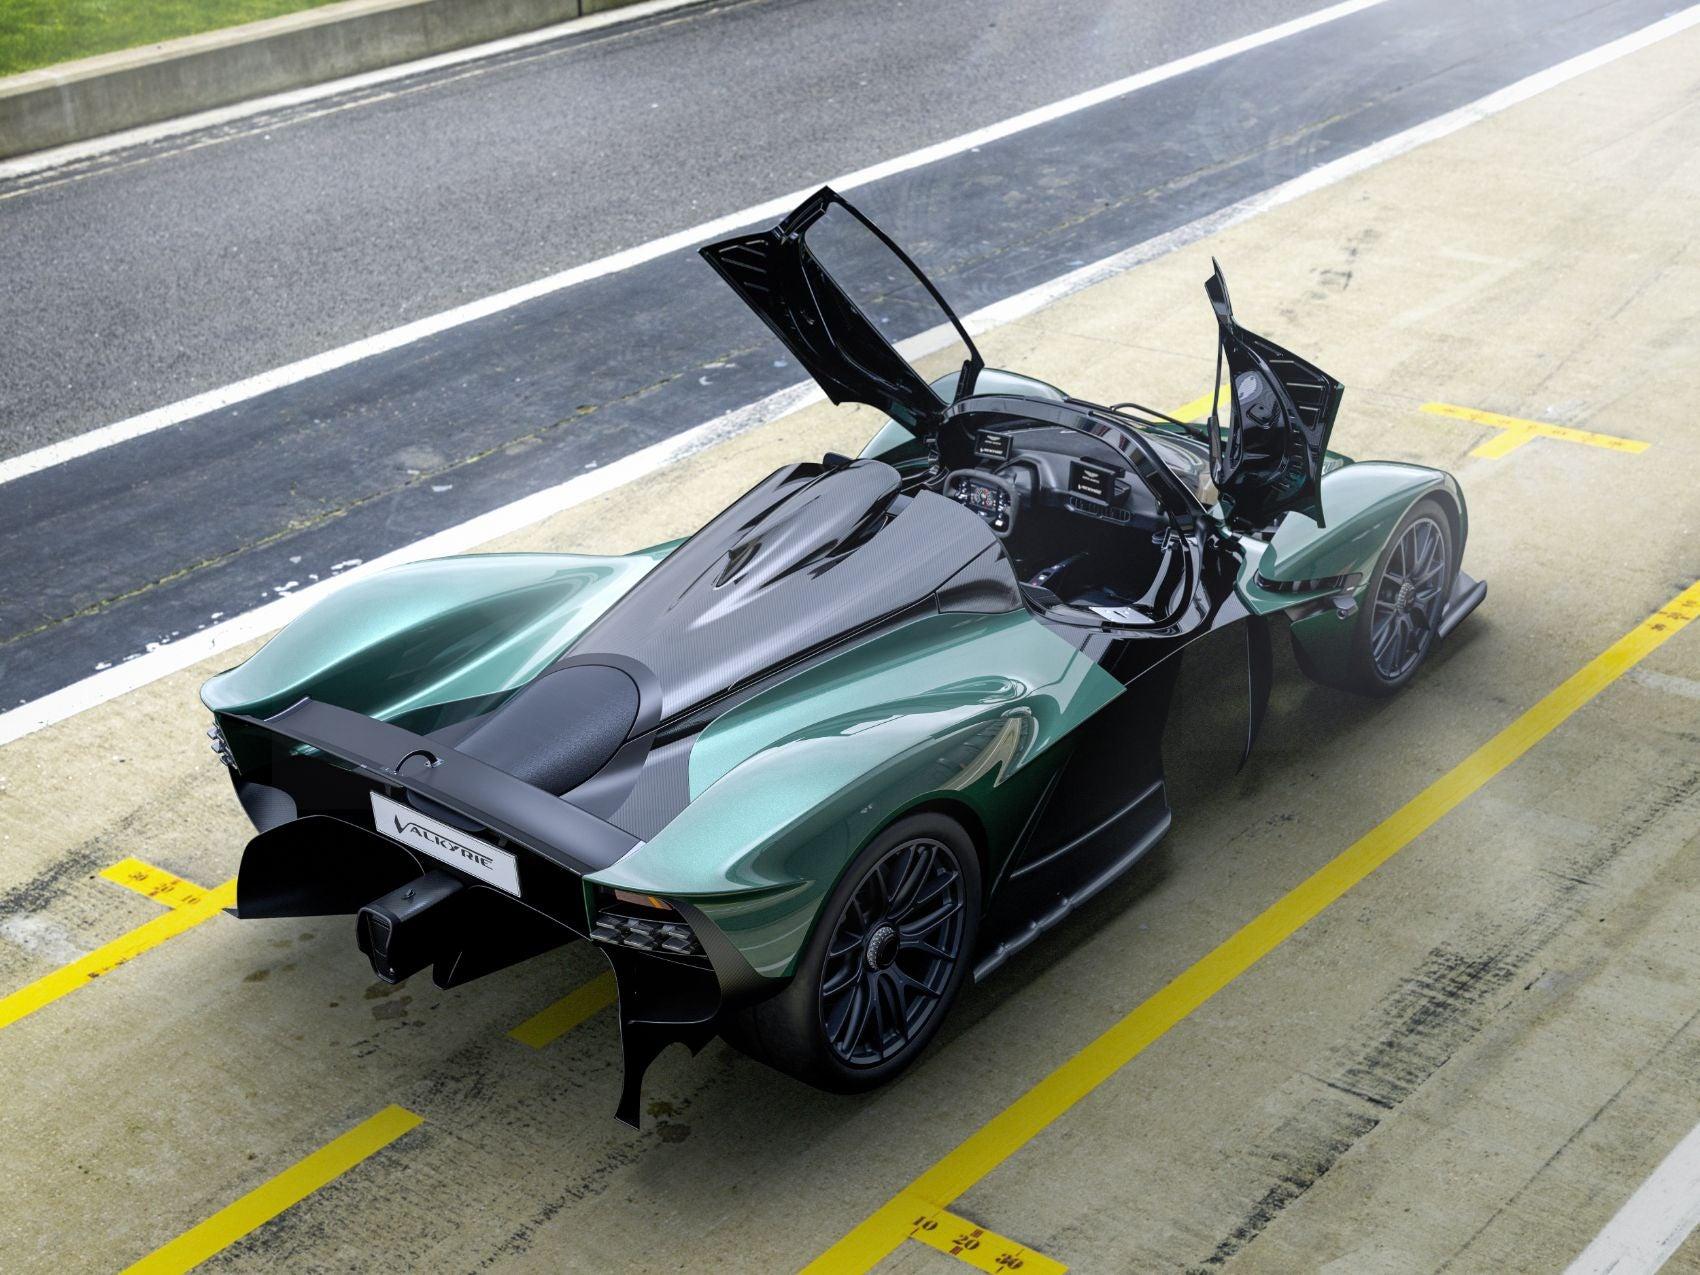 Aston Martin Valkyrie Spider: Adrian Newey Brainchild to Have Limited Production Run